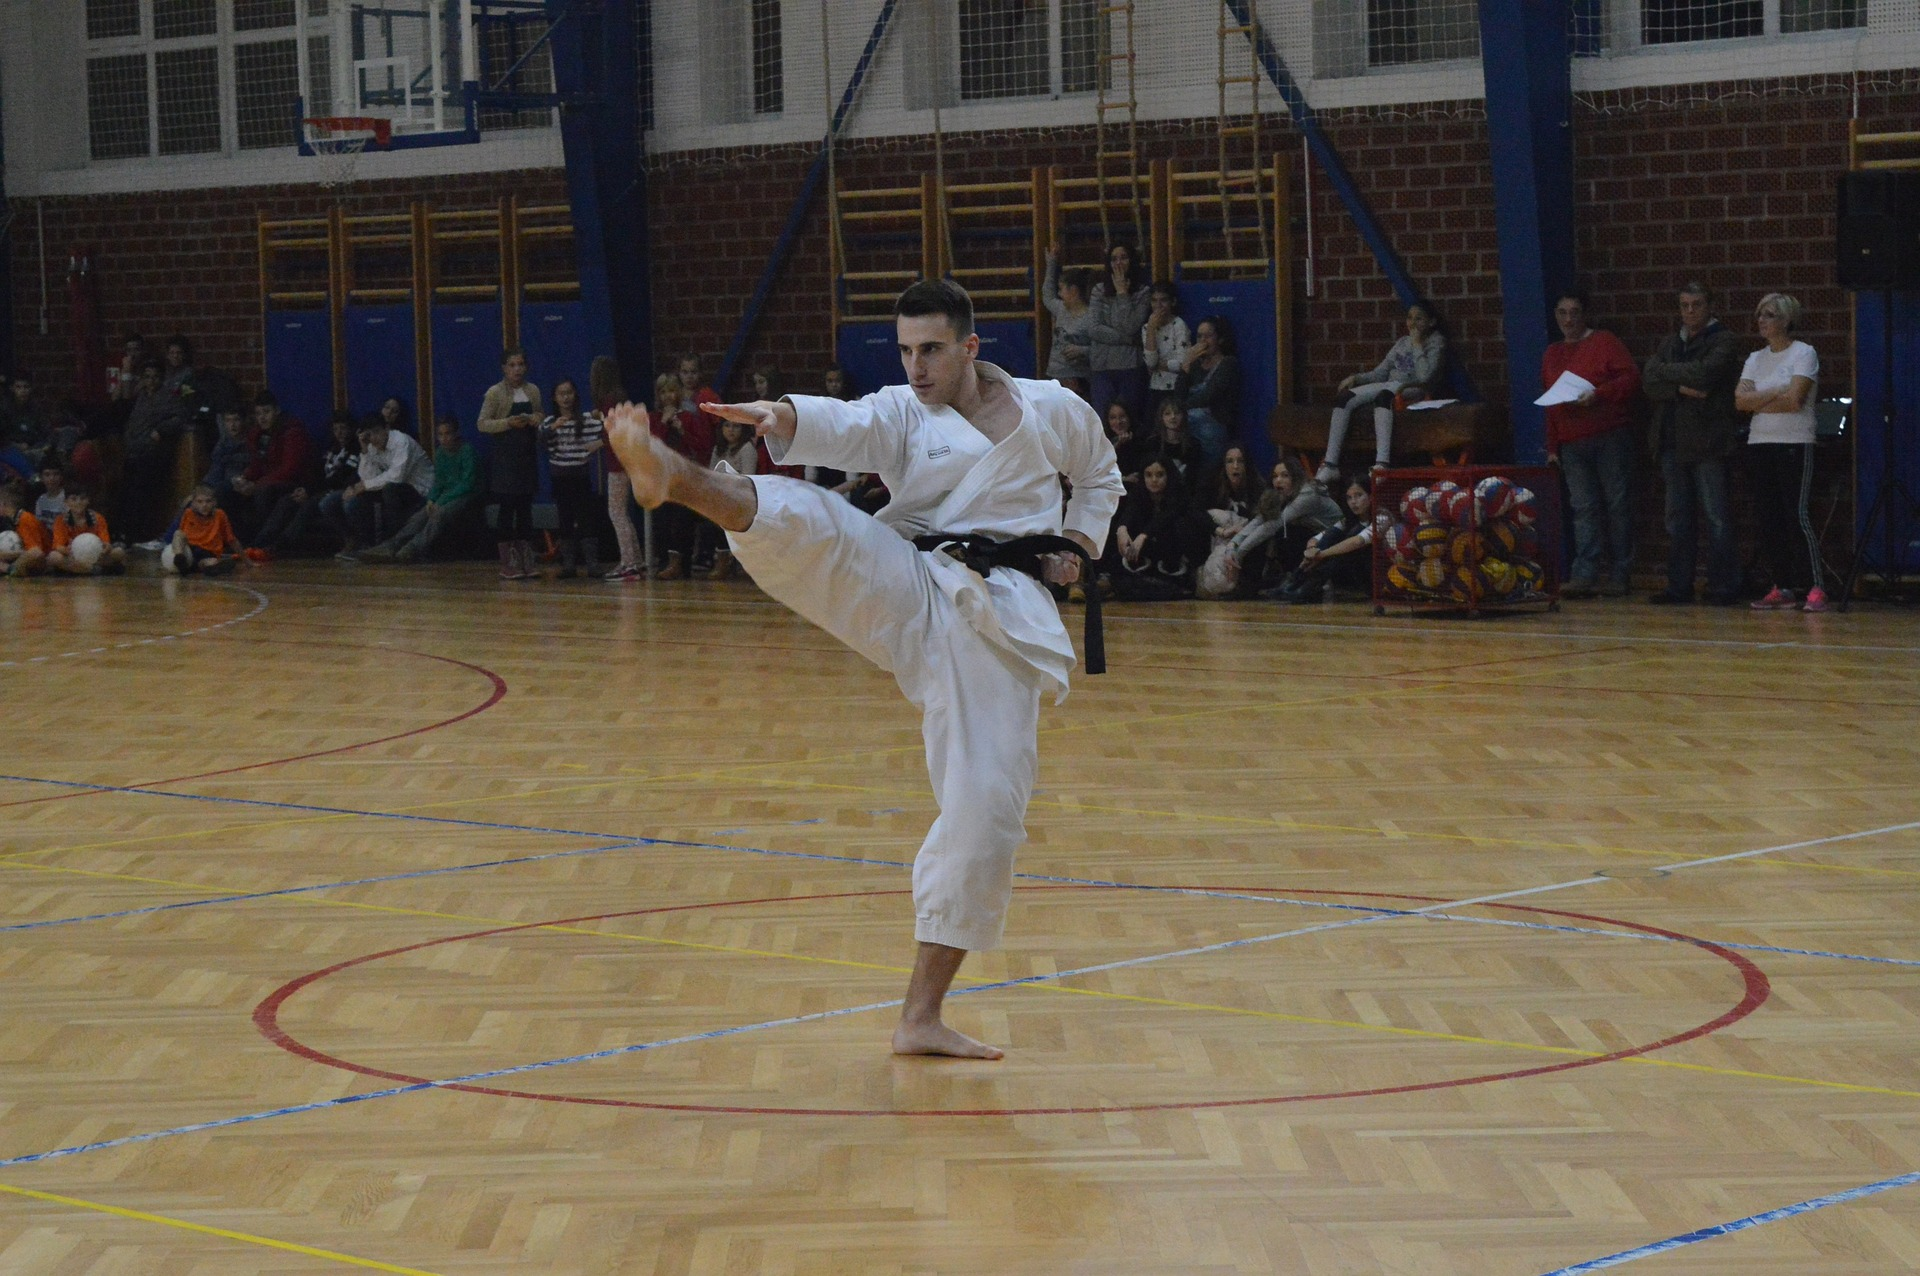 sport-1134595_1920